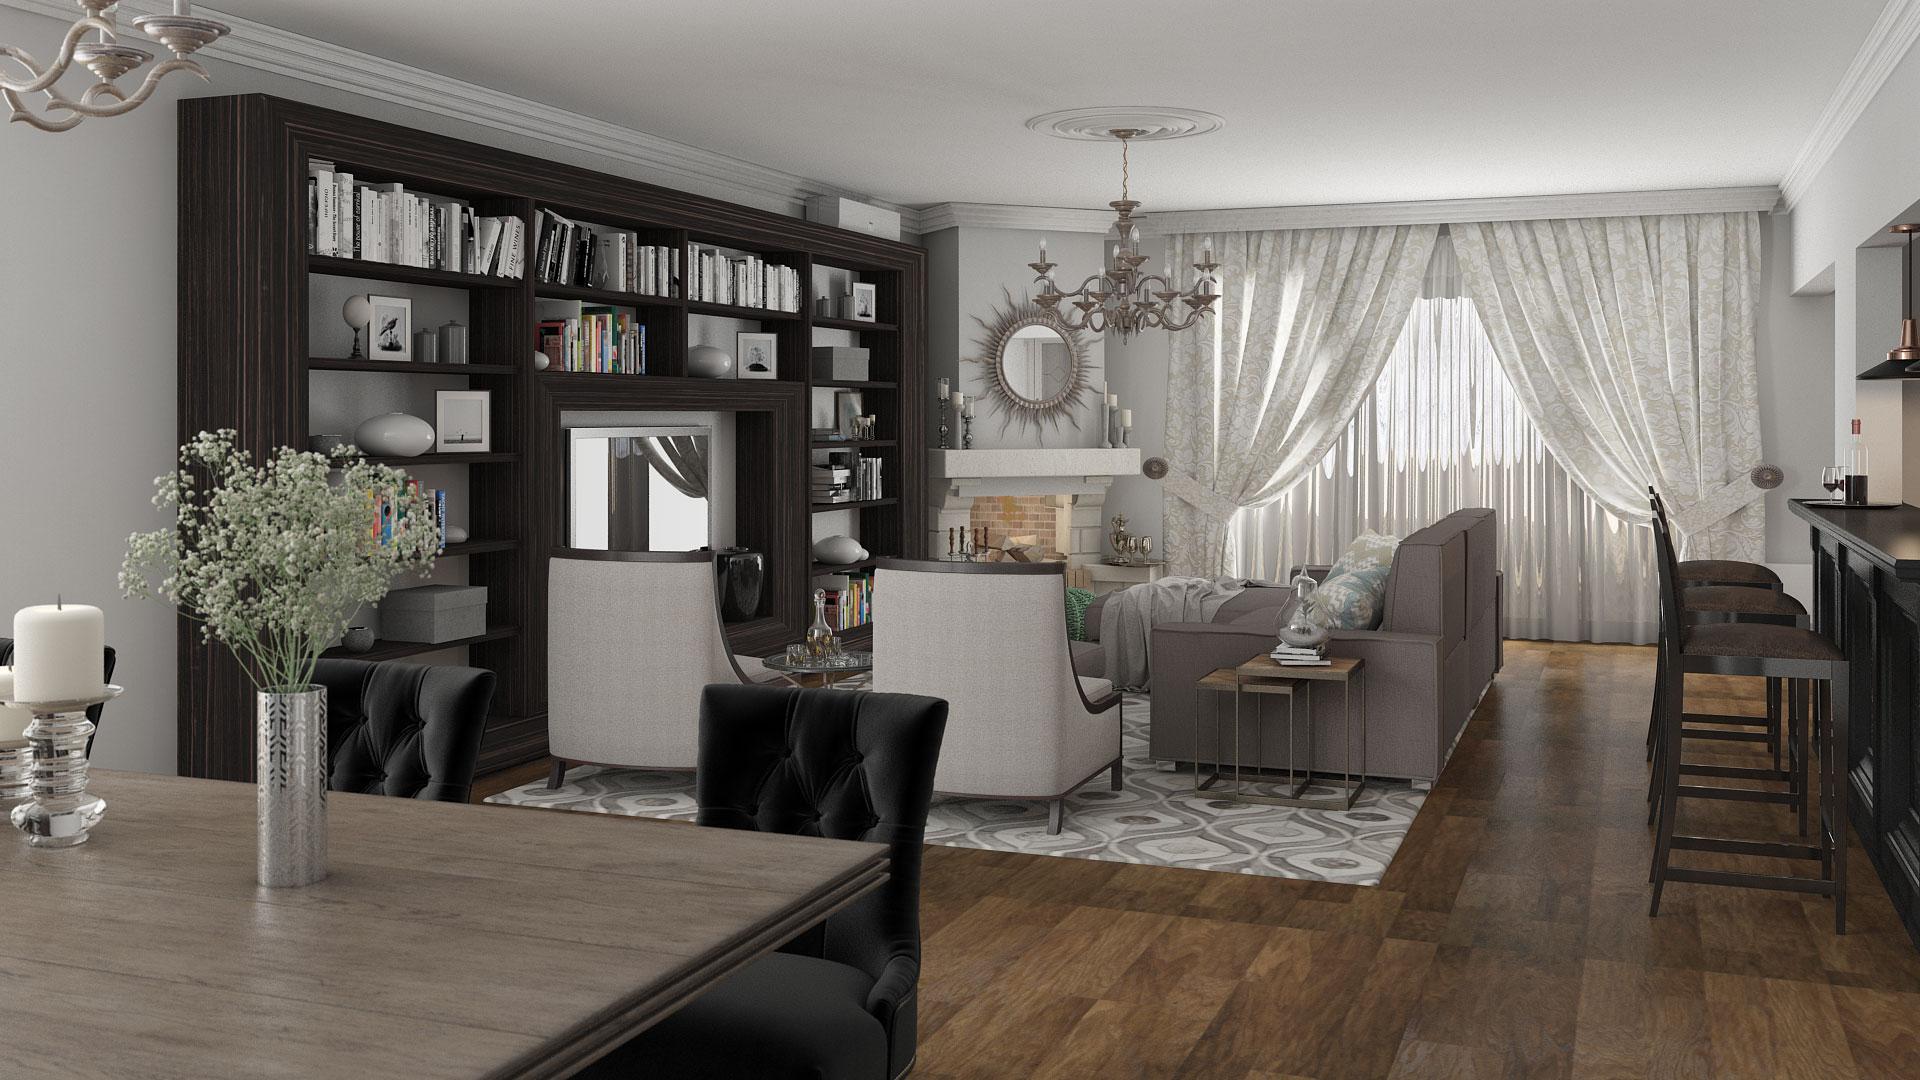 Andreea-Sofron-Atelierele-ILBAH-3dsmax-4